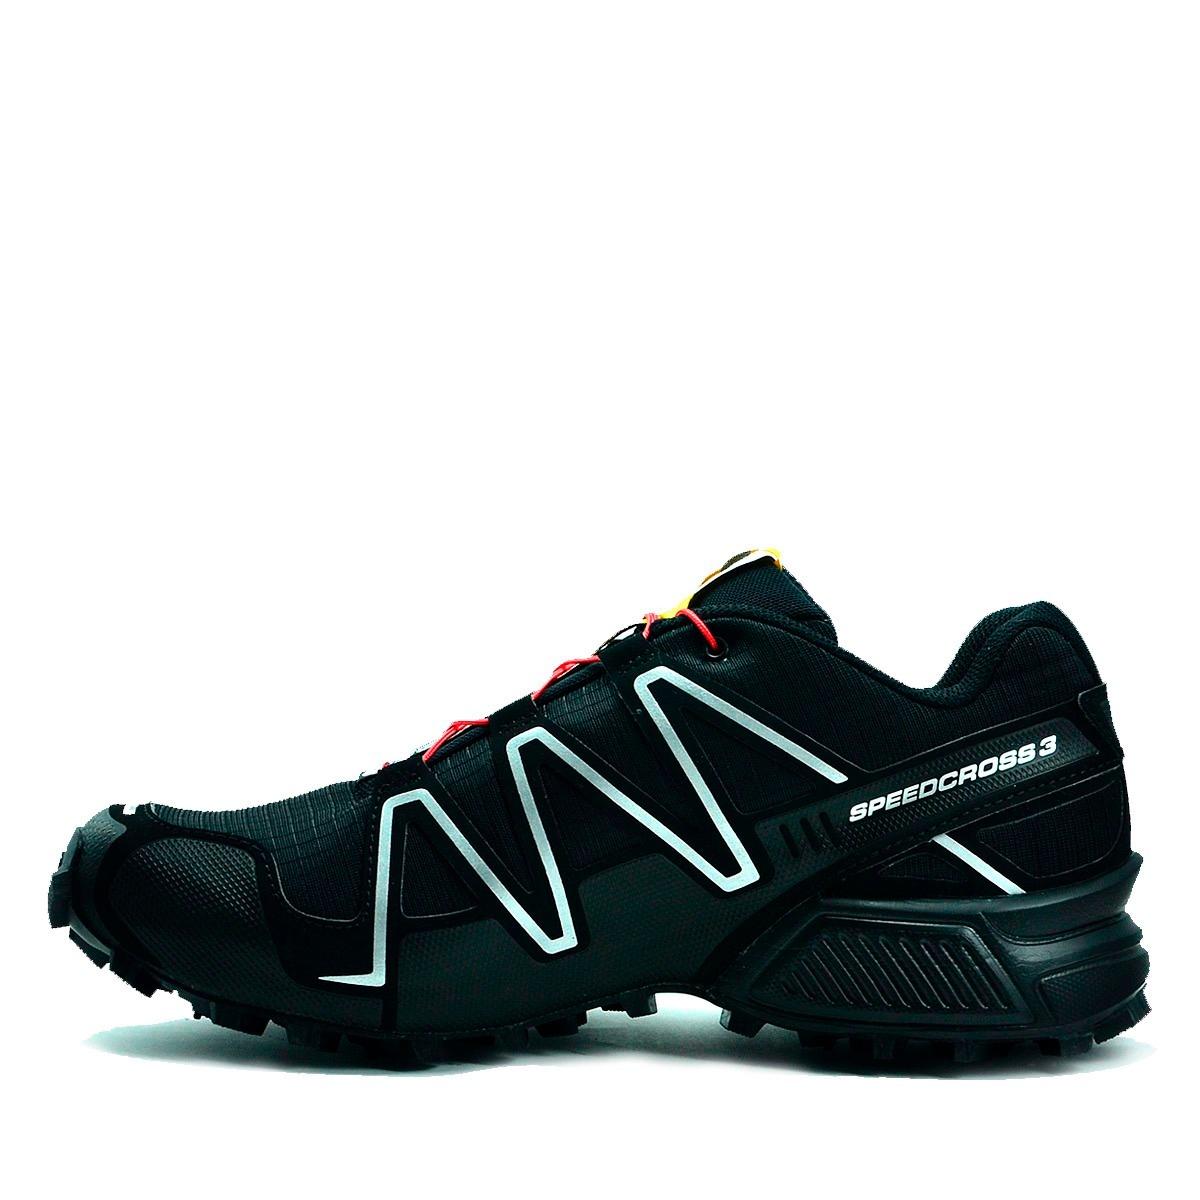 Zapatillas Salomon Speedcross 3 Hombre Negro